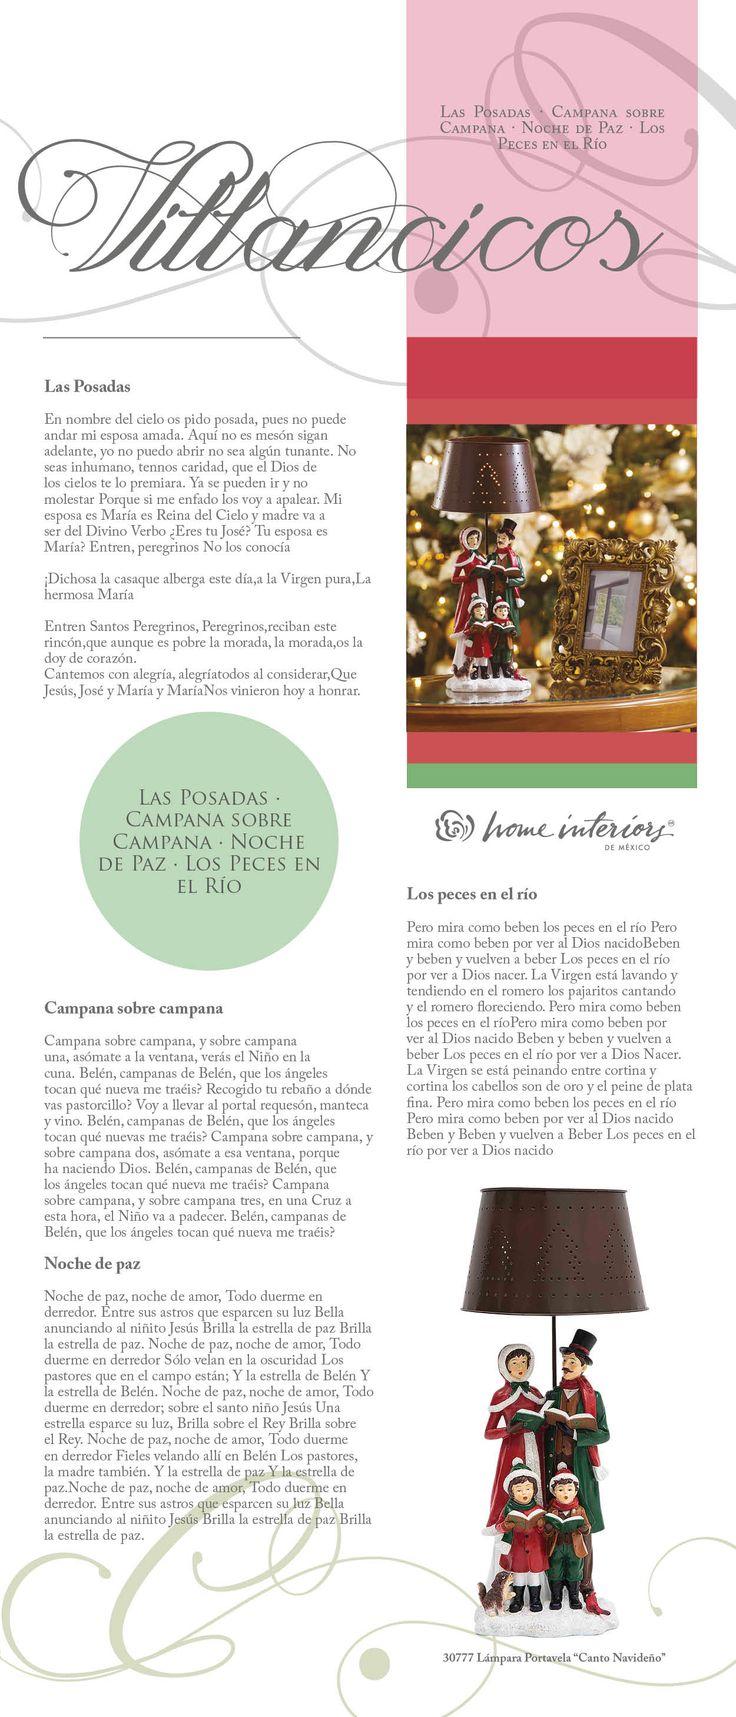 Workbooks las posadas worksheets : 25+ unique Villancicos navideños mexicanos ideas on Pinterest ...